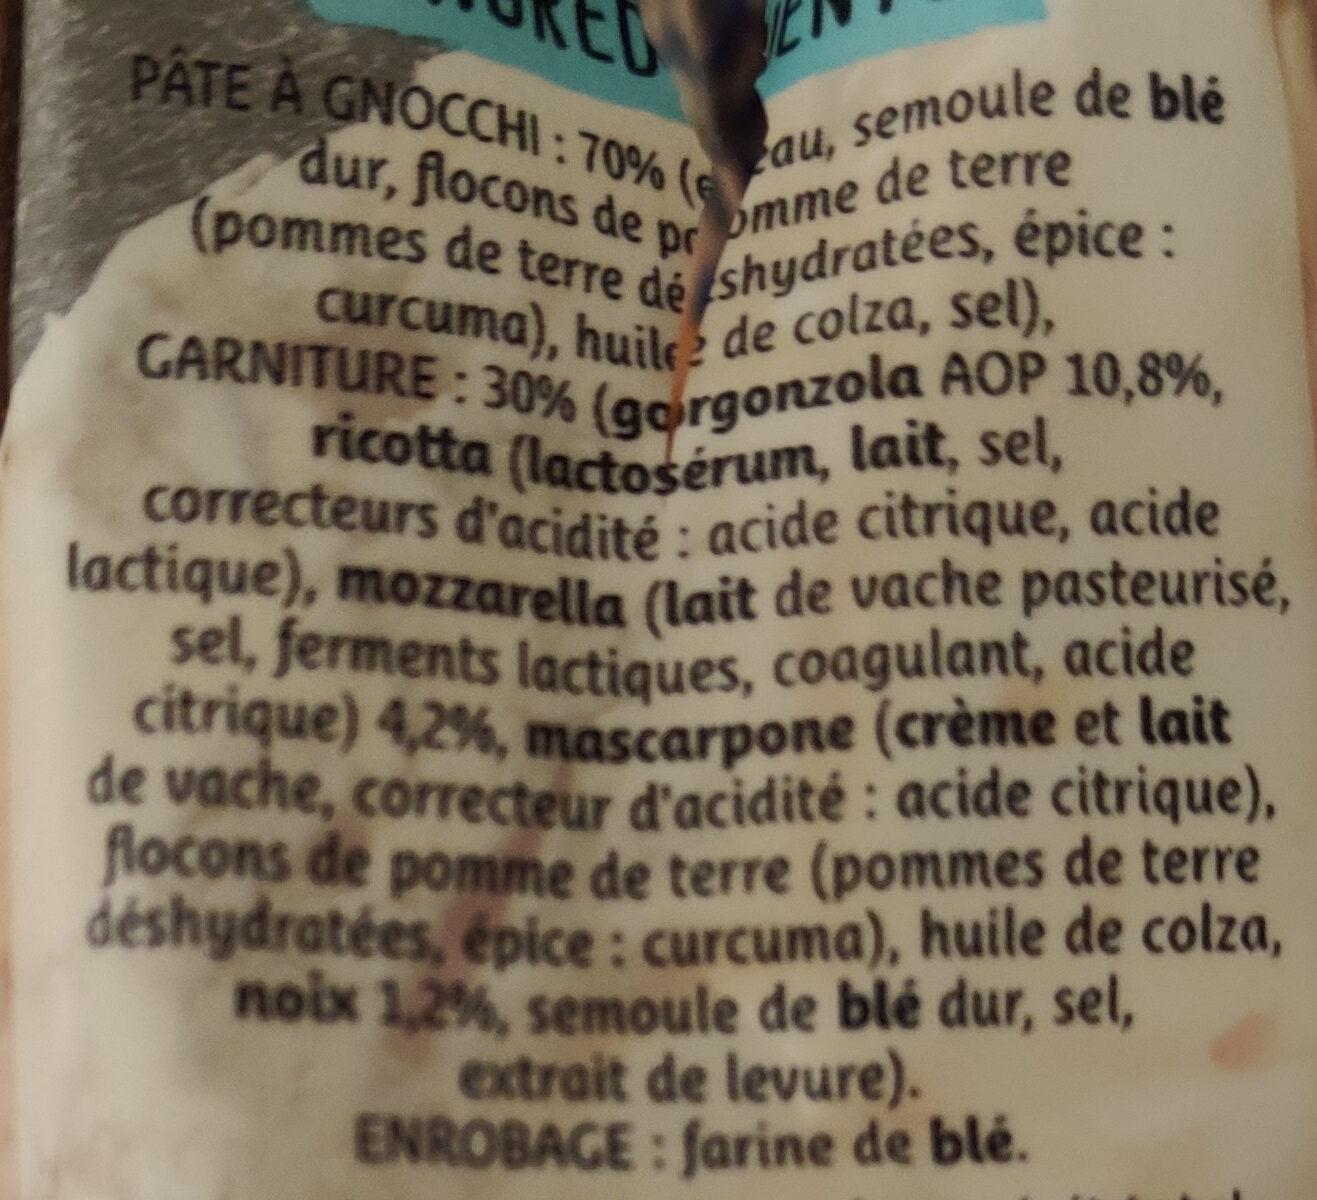 Gnocchi farcis gorgonzola et noix - Ingredients